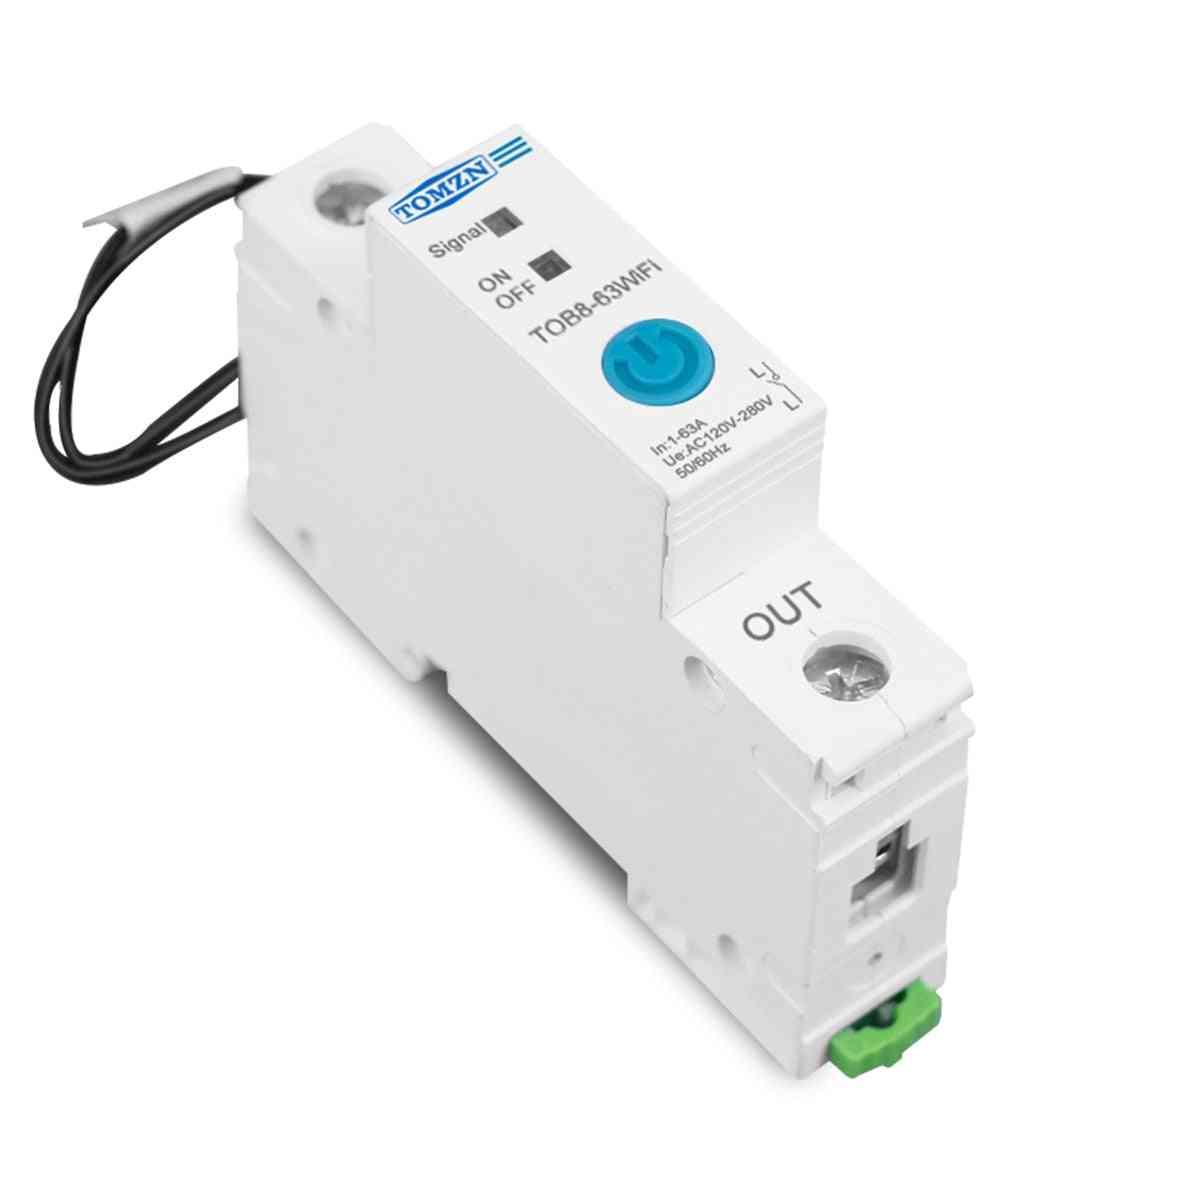 63a Ewelink Single Phase Wifi Smart Energy Metering Monitoring Circuit Breaker Timer Relay